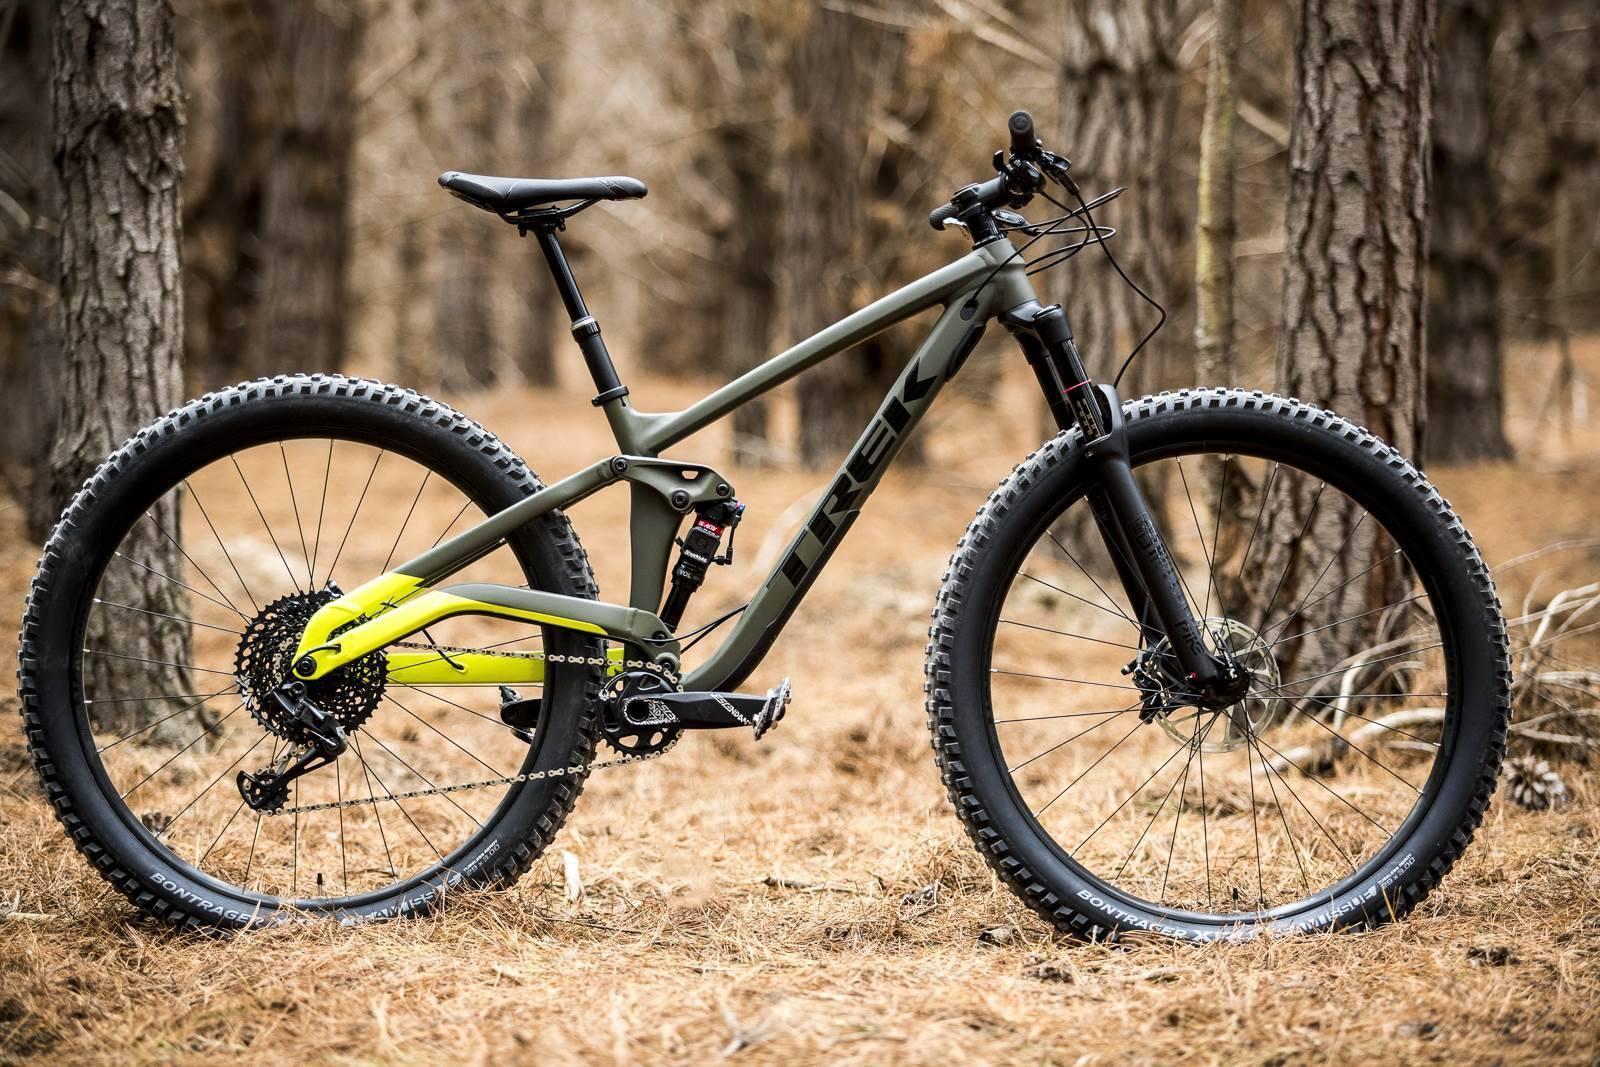 1d347b083b1 TESTED: Trek Full Stache 29 Plus trail bike - Australian Mountain Bike |  The home for Australian Mountain Bikes